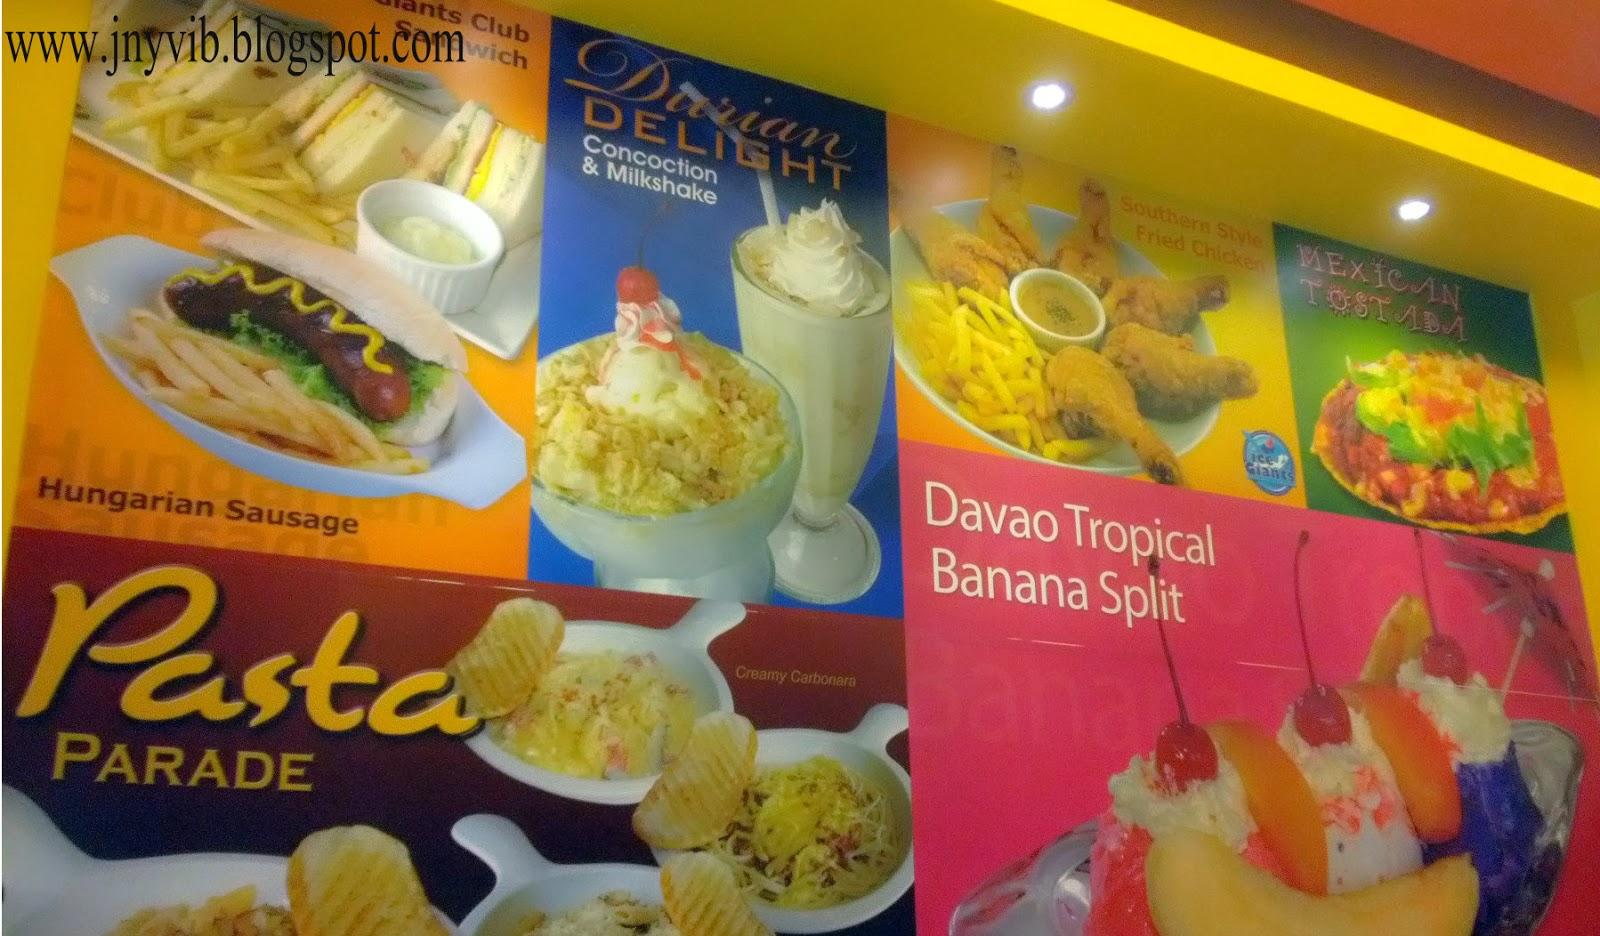 ice giants cebu menu - photo #19